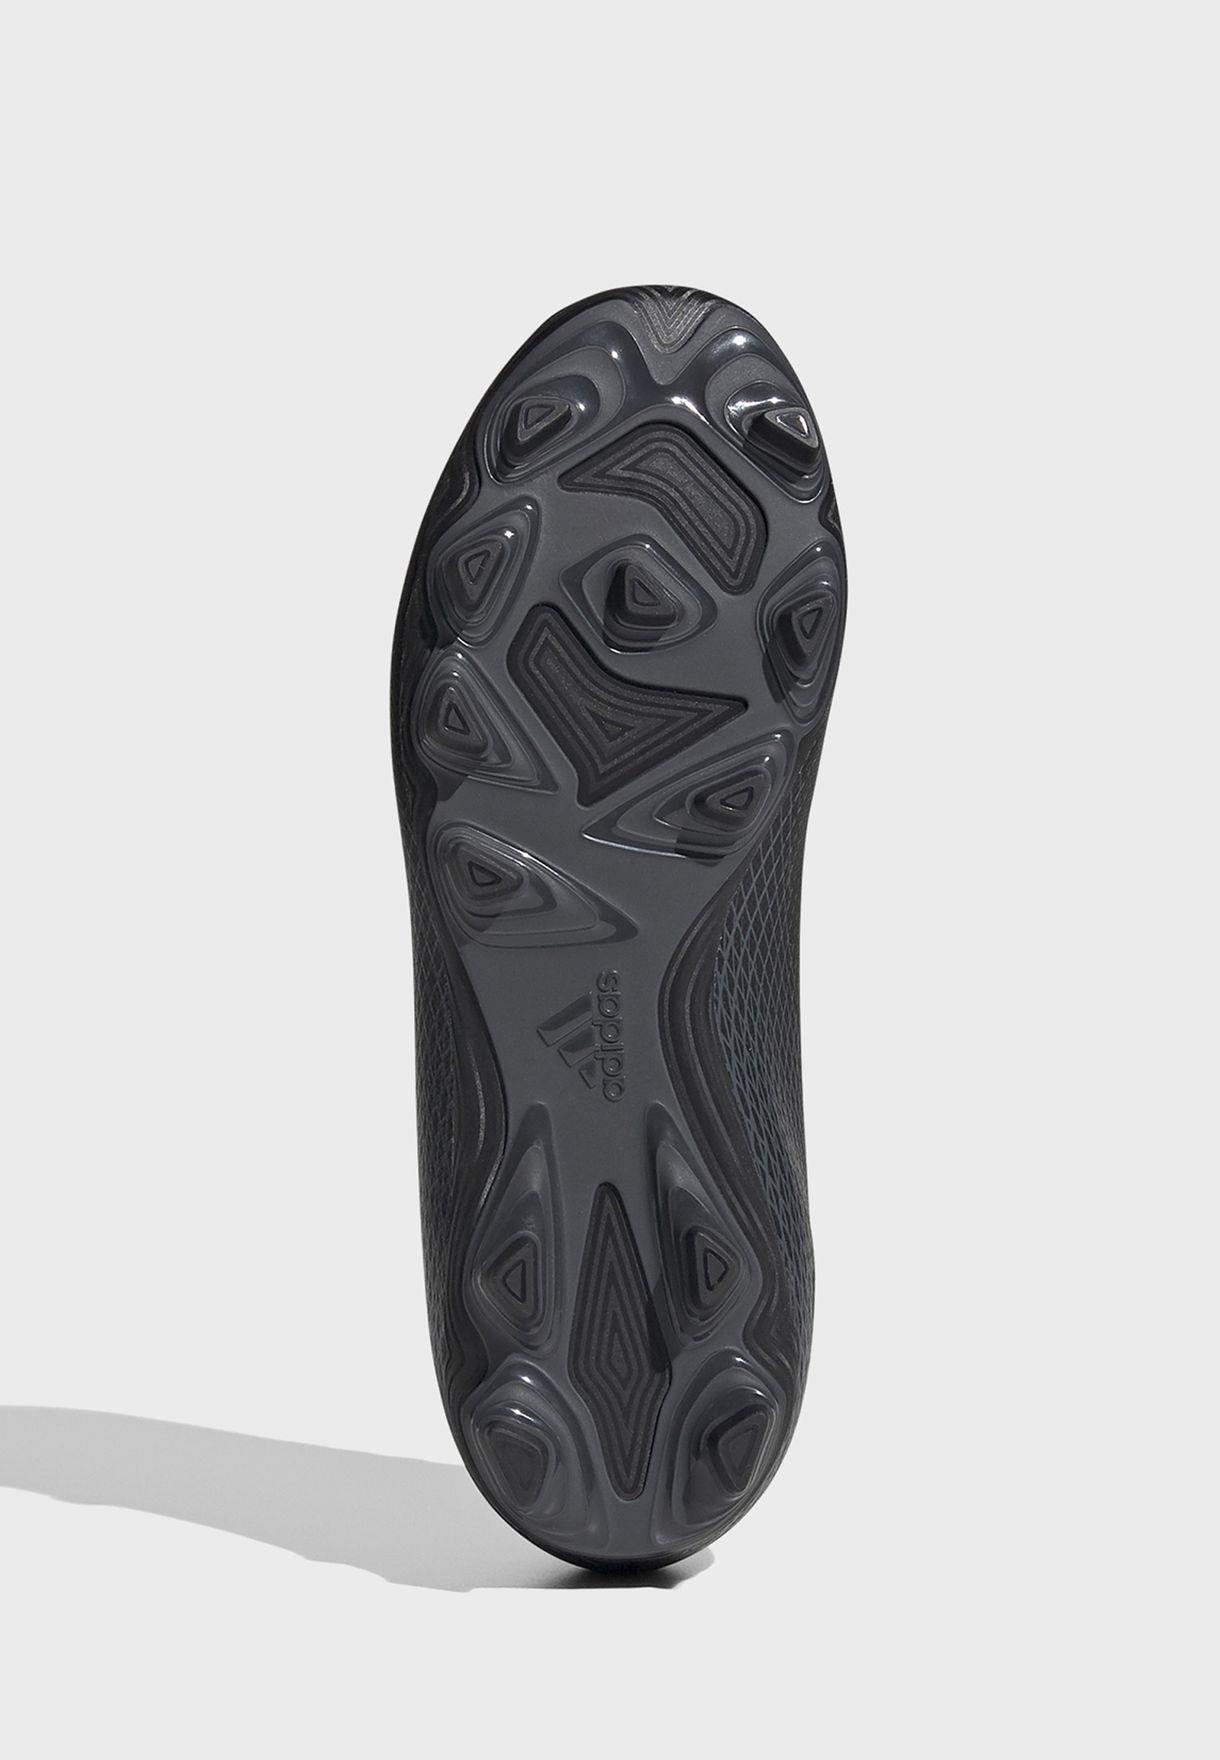 حذاء اكس غوستيد 4 اف اكس جي